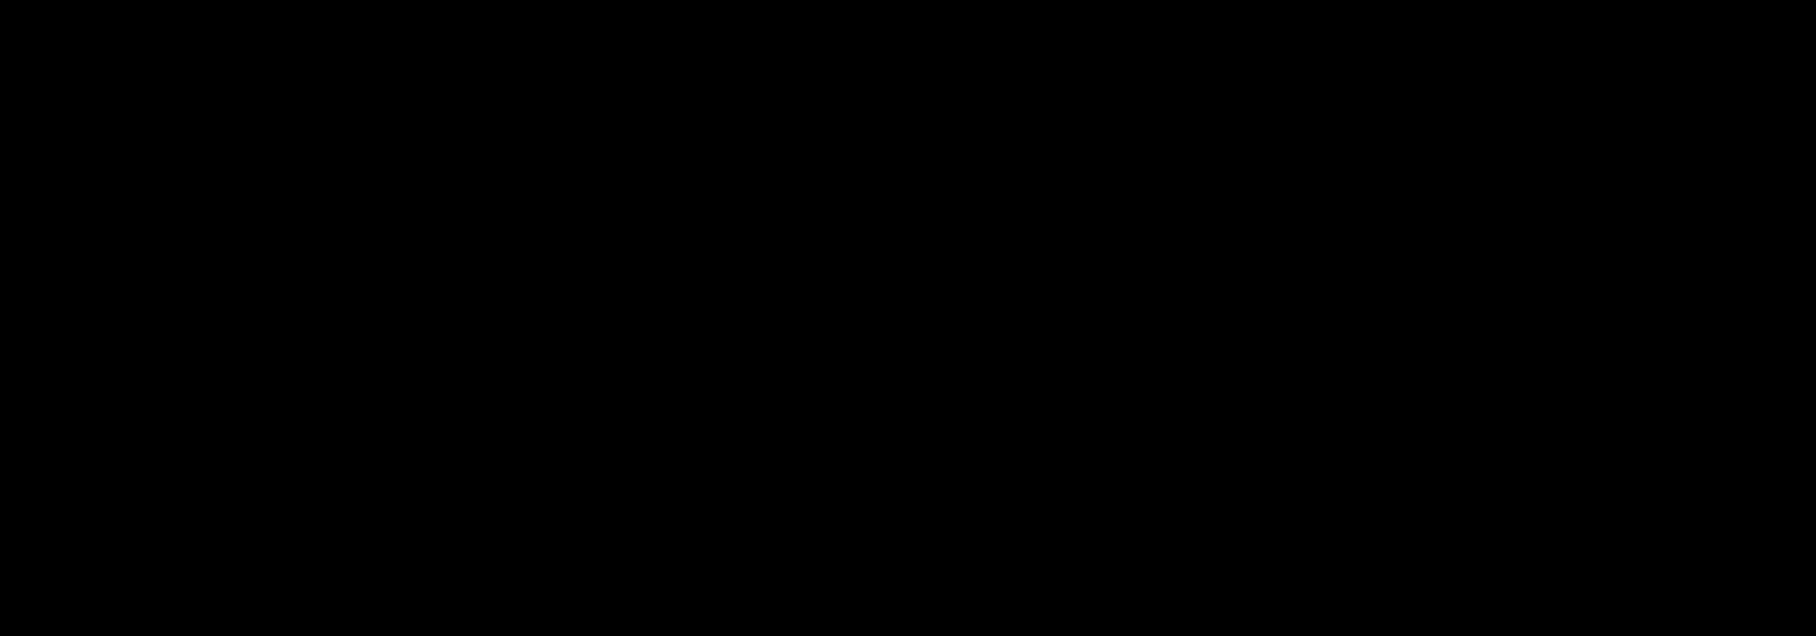 5-Bromo-6-chloro-3-indolyl β-D-glucuronide cyclohexylammonium salt